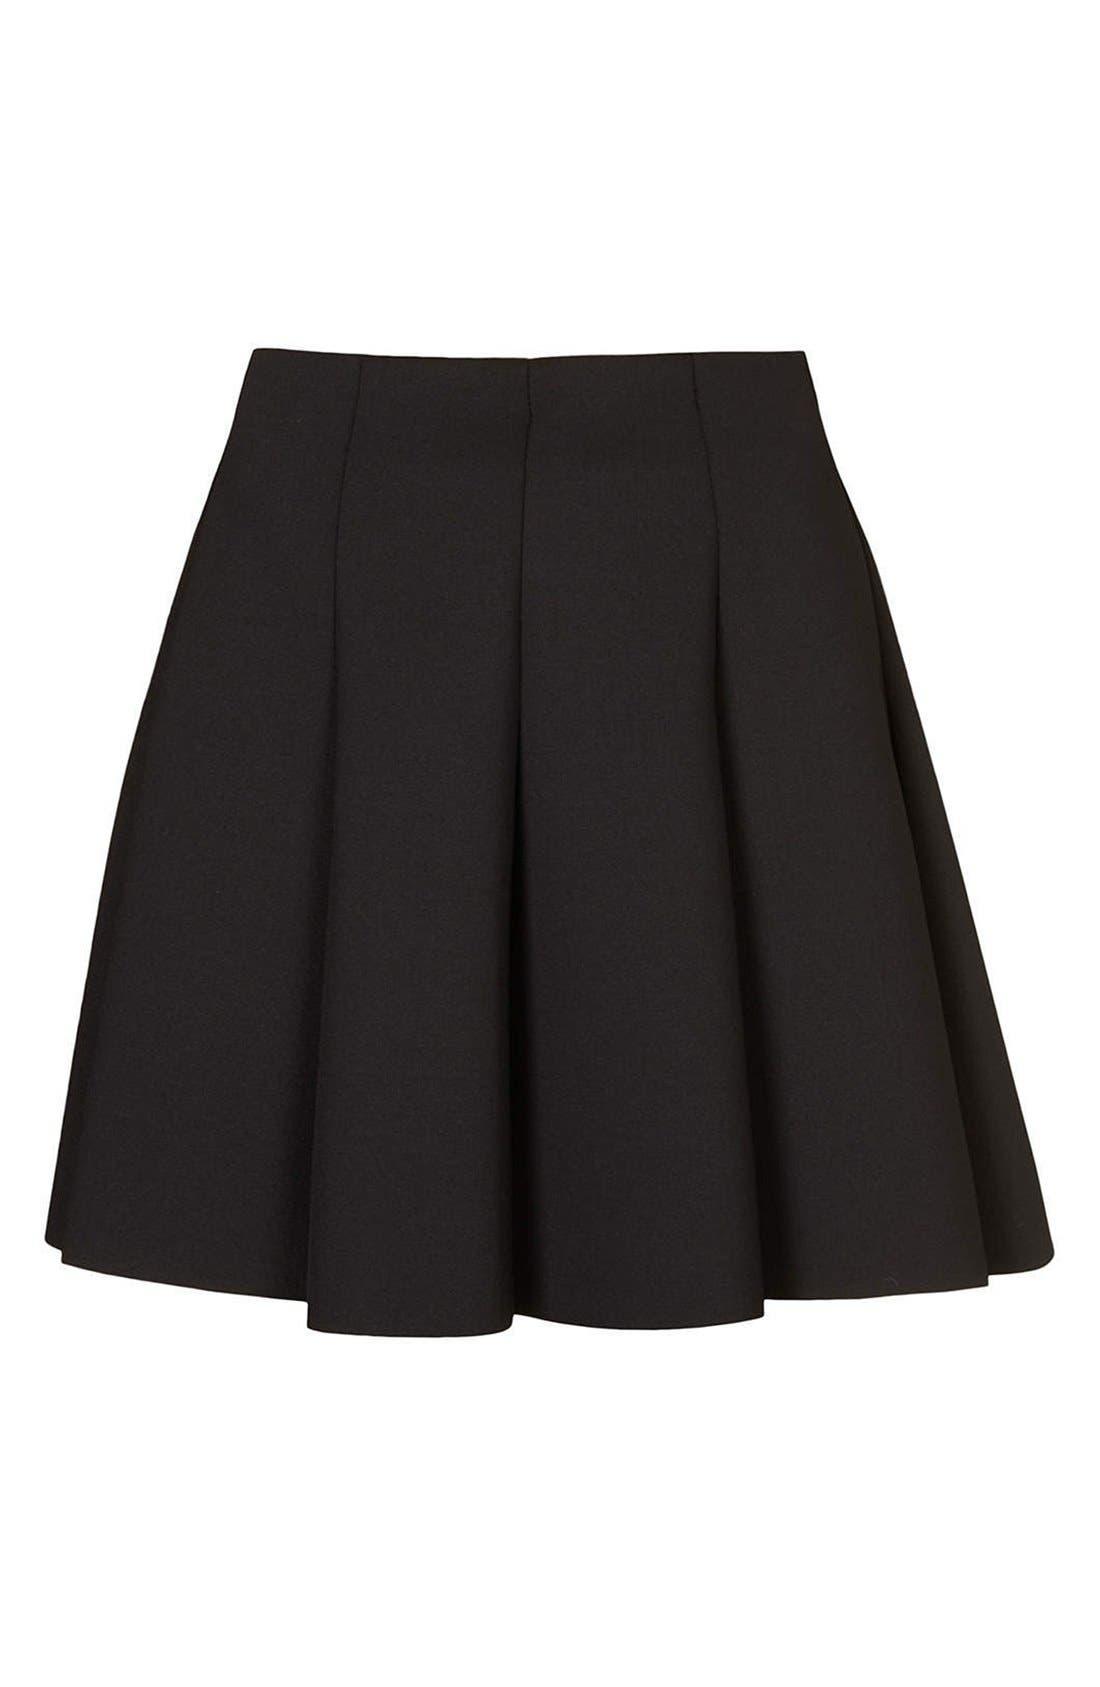 Alternate Image 3  - Topshop Pleat Scuba Skirt (Petite)